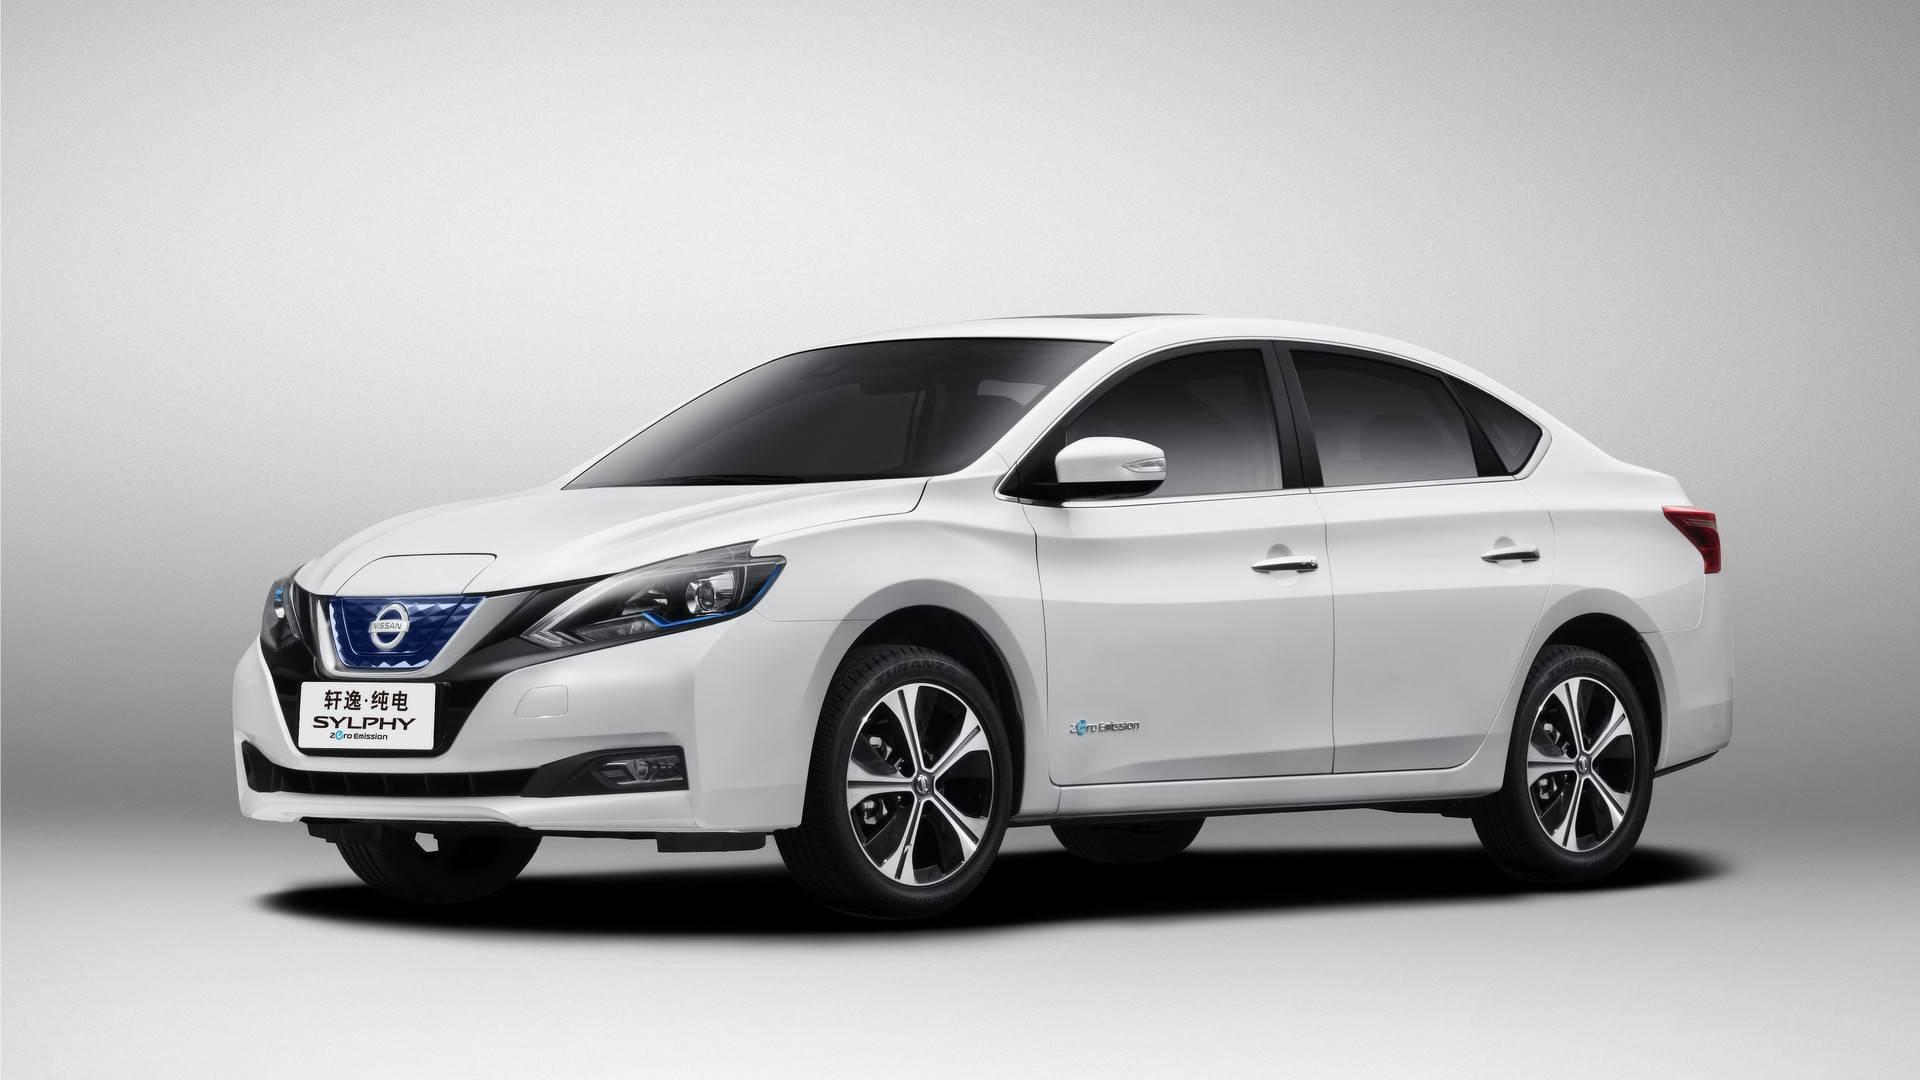 2018 Nissan Altima >> 2018 Nissan Sylphy Zero Emission is Half Sentra, Half Leaf - autoevolution